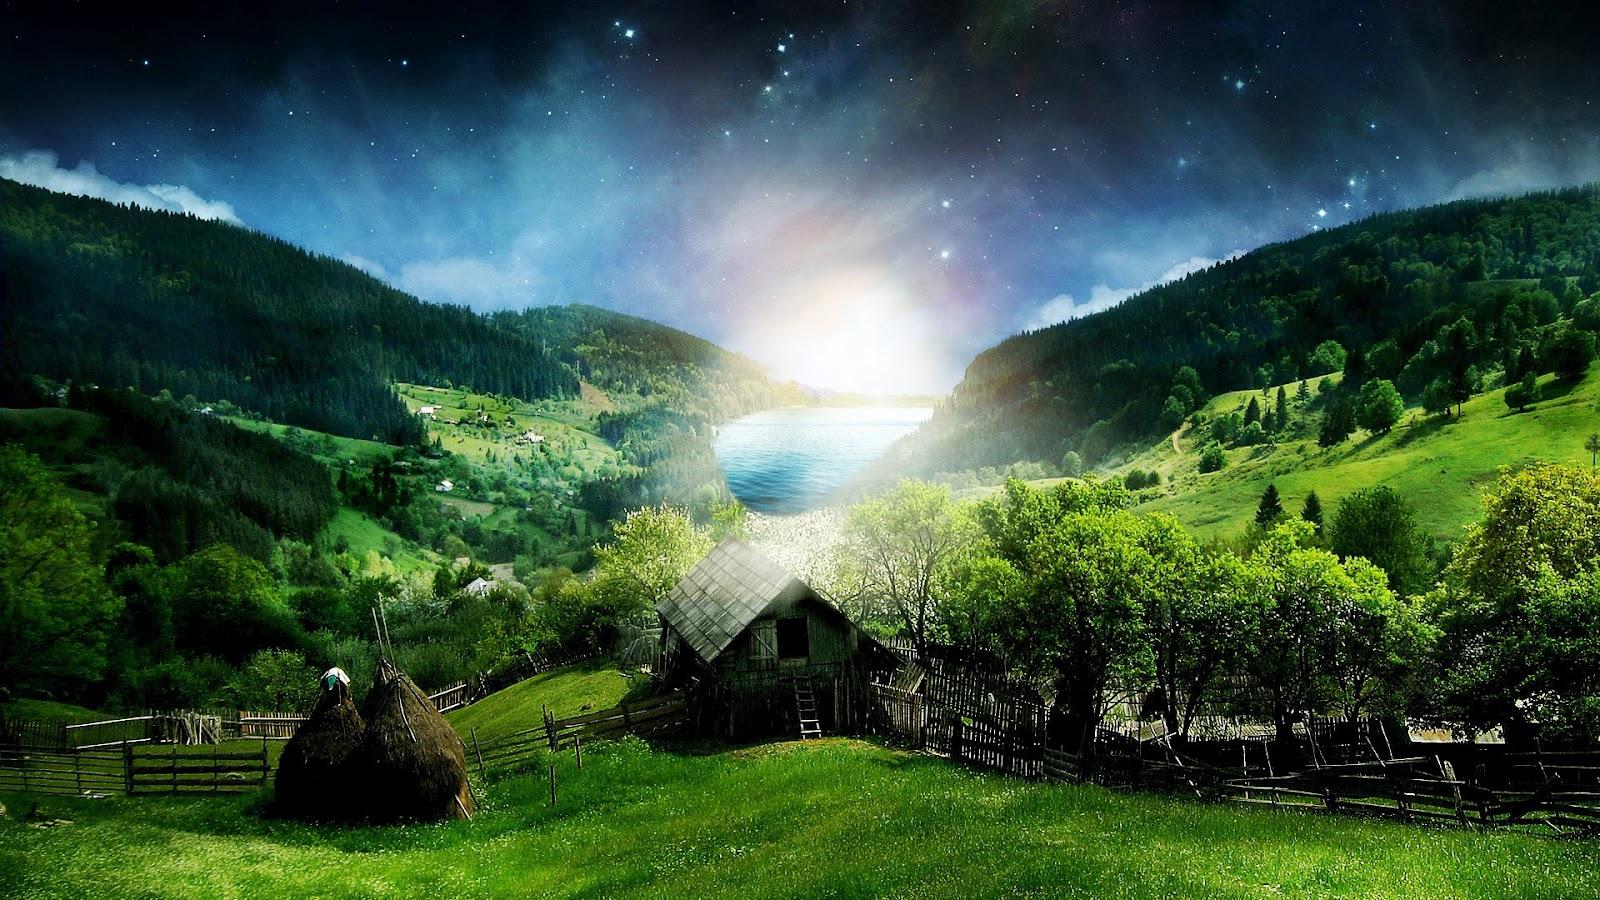 green full HD nature background wallpaper for laptop widescreenjpg 1600x900